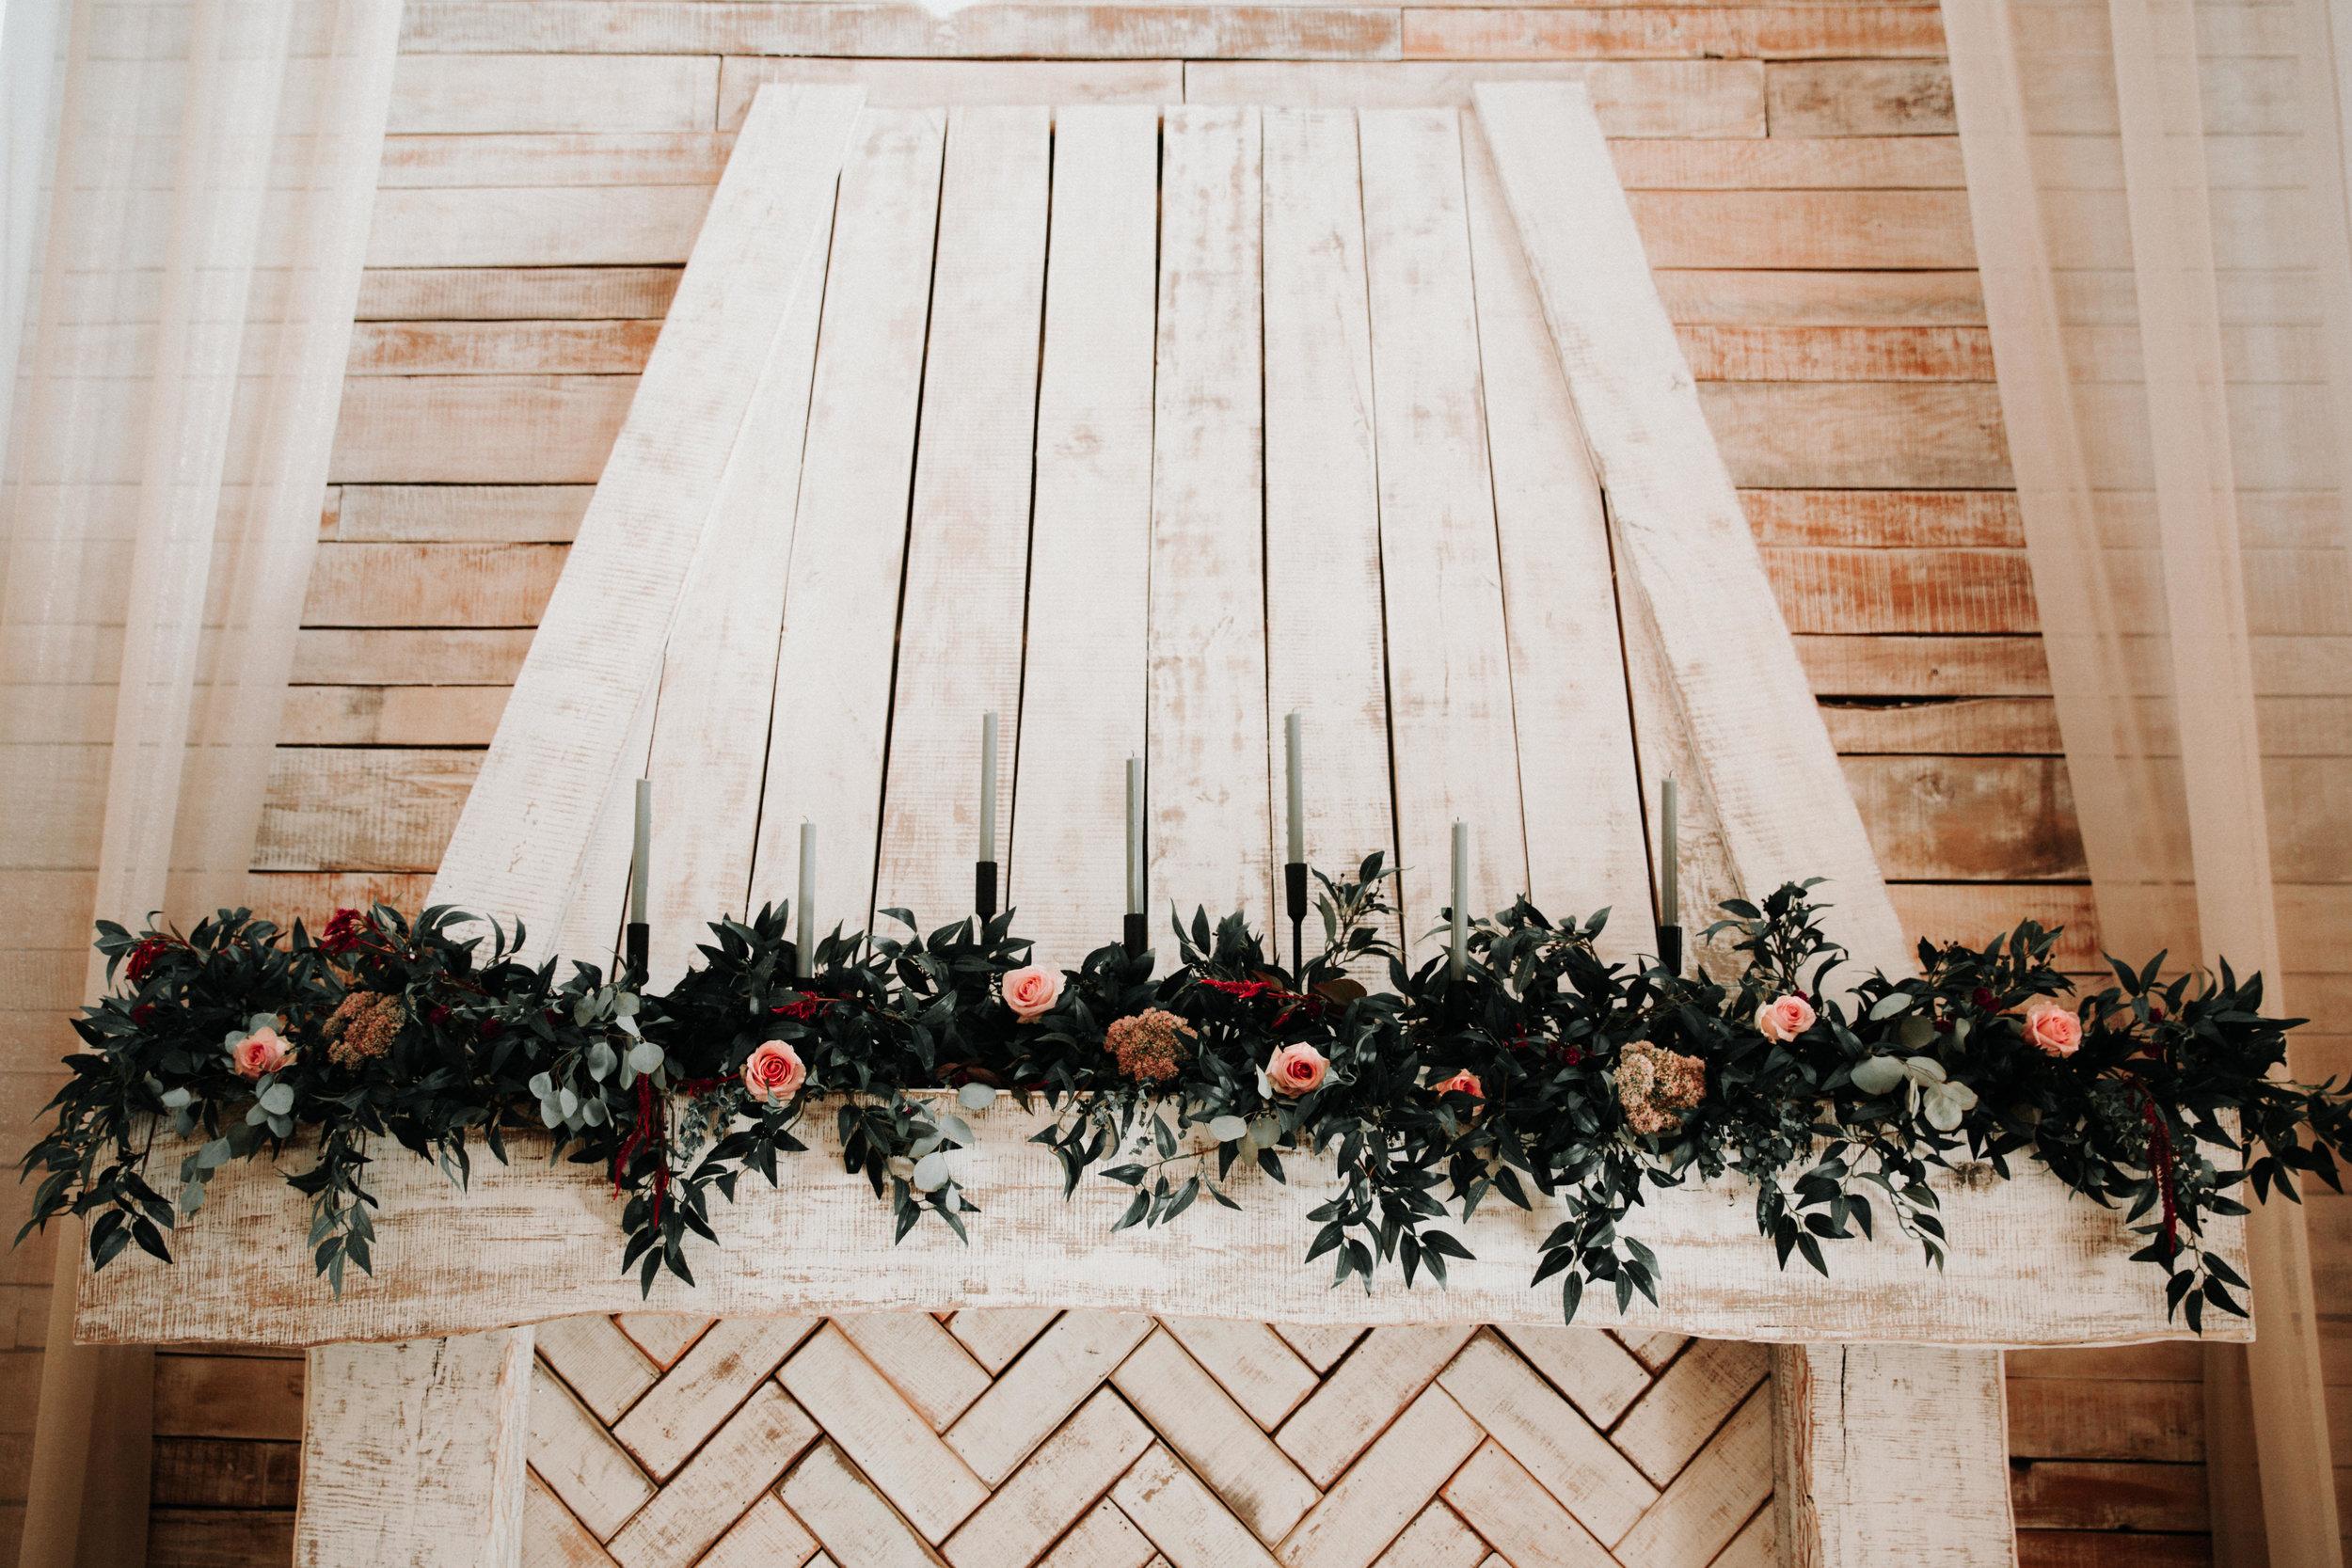 Gorgeous Barn Wedding Decor - Athens, Tennessee Barn Wedding -- The Overwhelmed Bride Wedding Blog